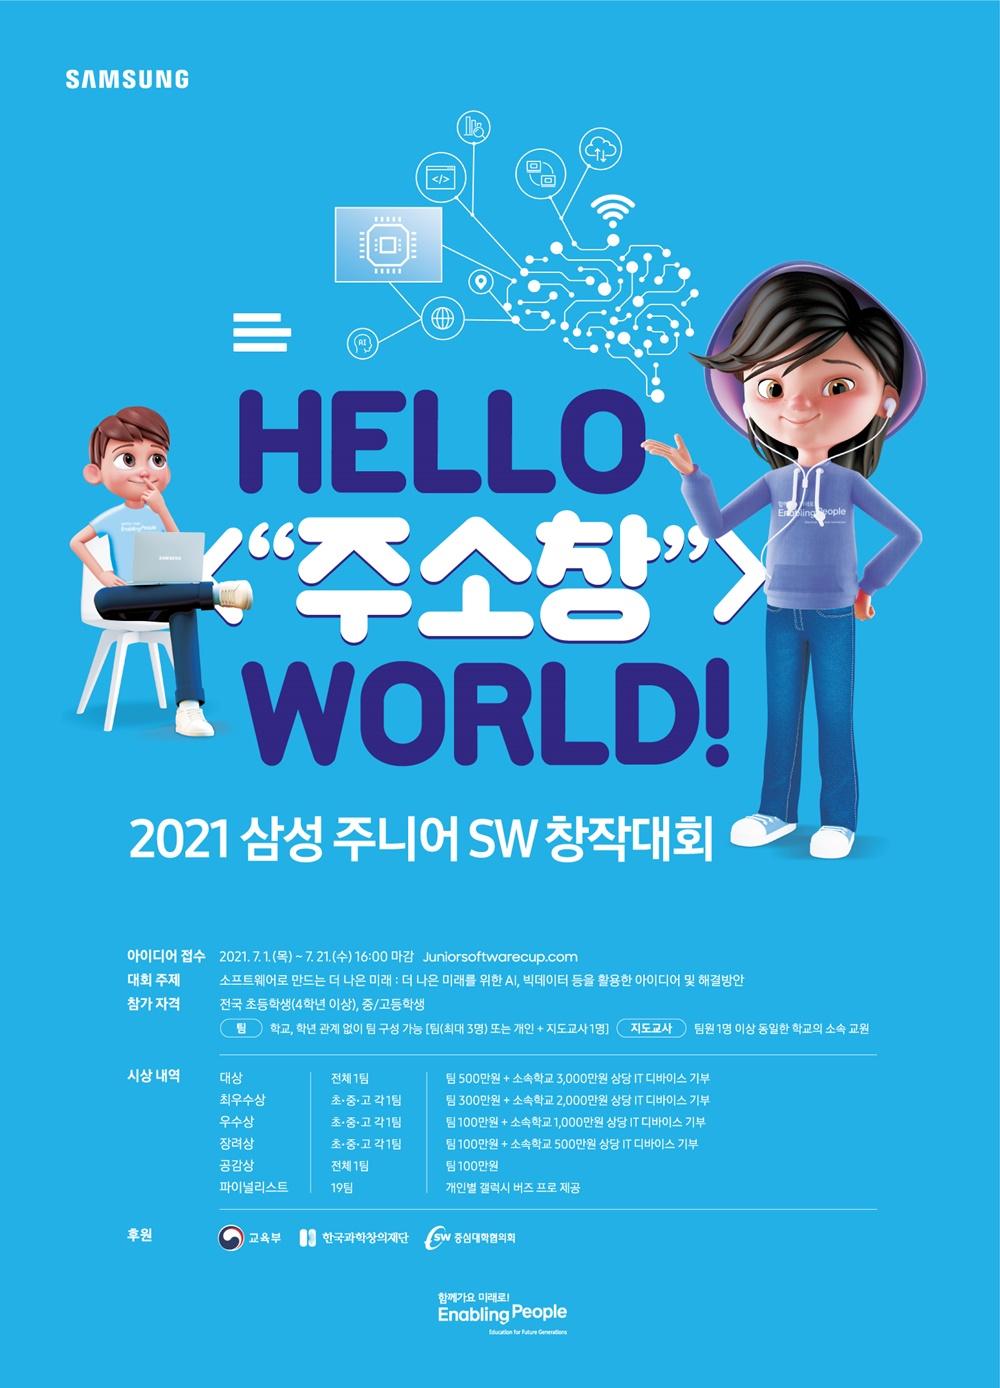 "samsung hello ""주소창"" world! 2021 삼성 주니어 sw 창작대회"